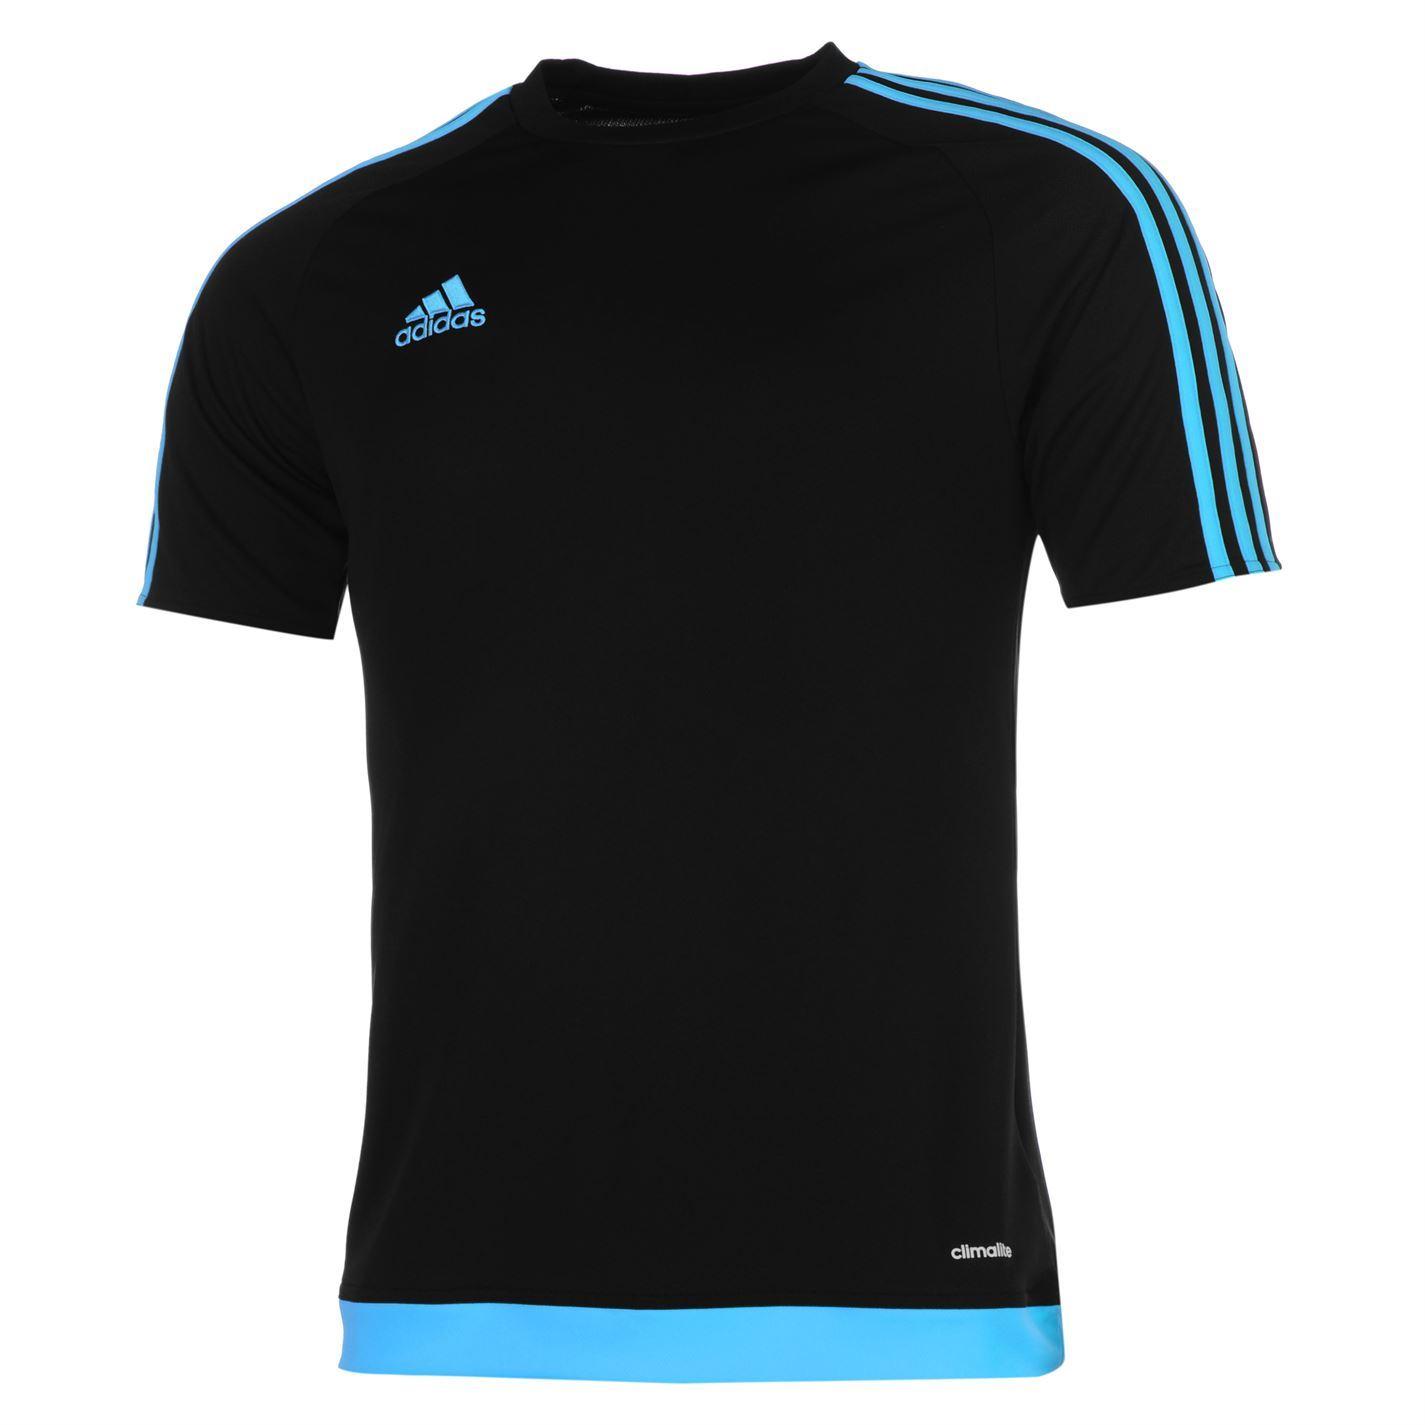 adidas 3 stripe estro t shirt mens black blue top tee. Black Bedroom Furniture Sets. Home Design Ideas